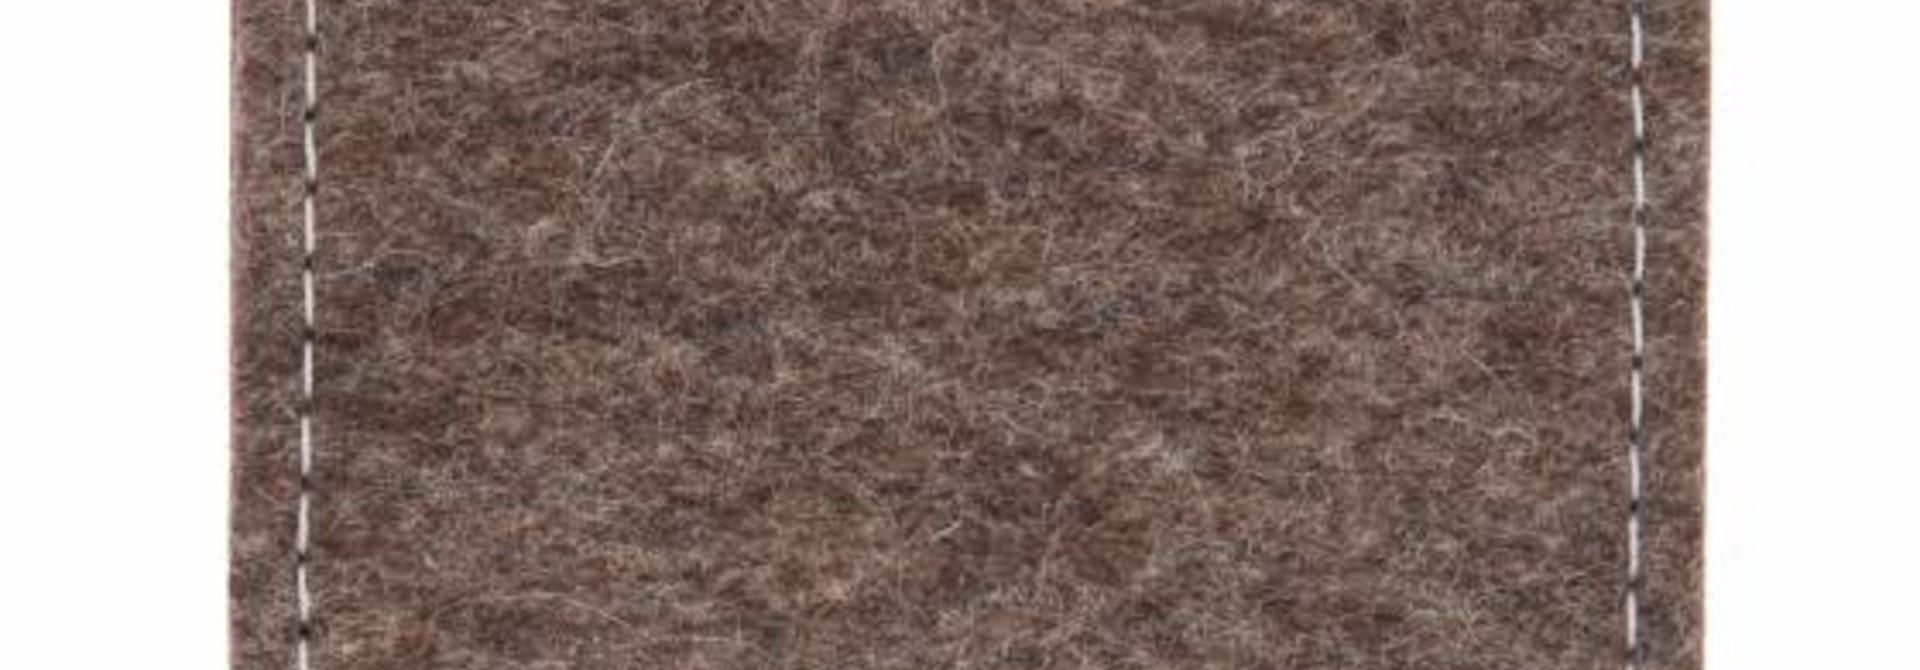 Mi / Redmi Sleeve Natur-Meliert